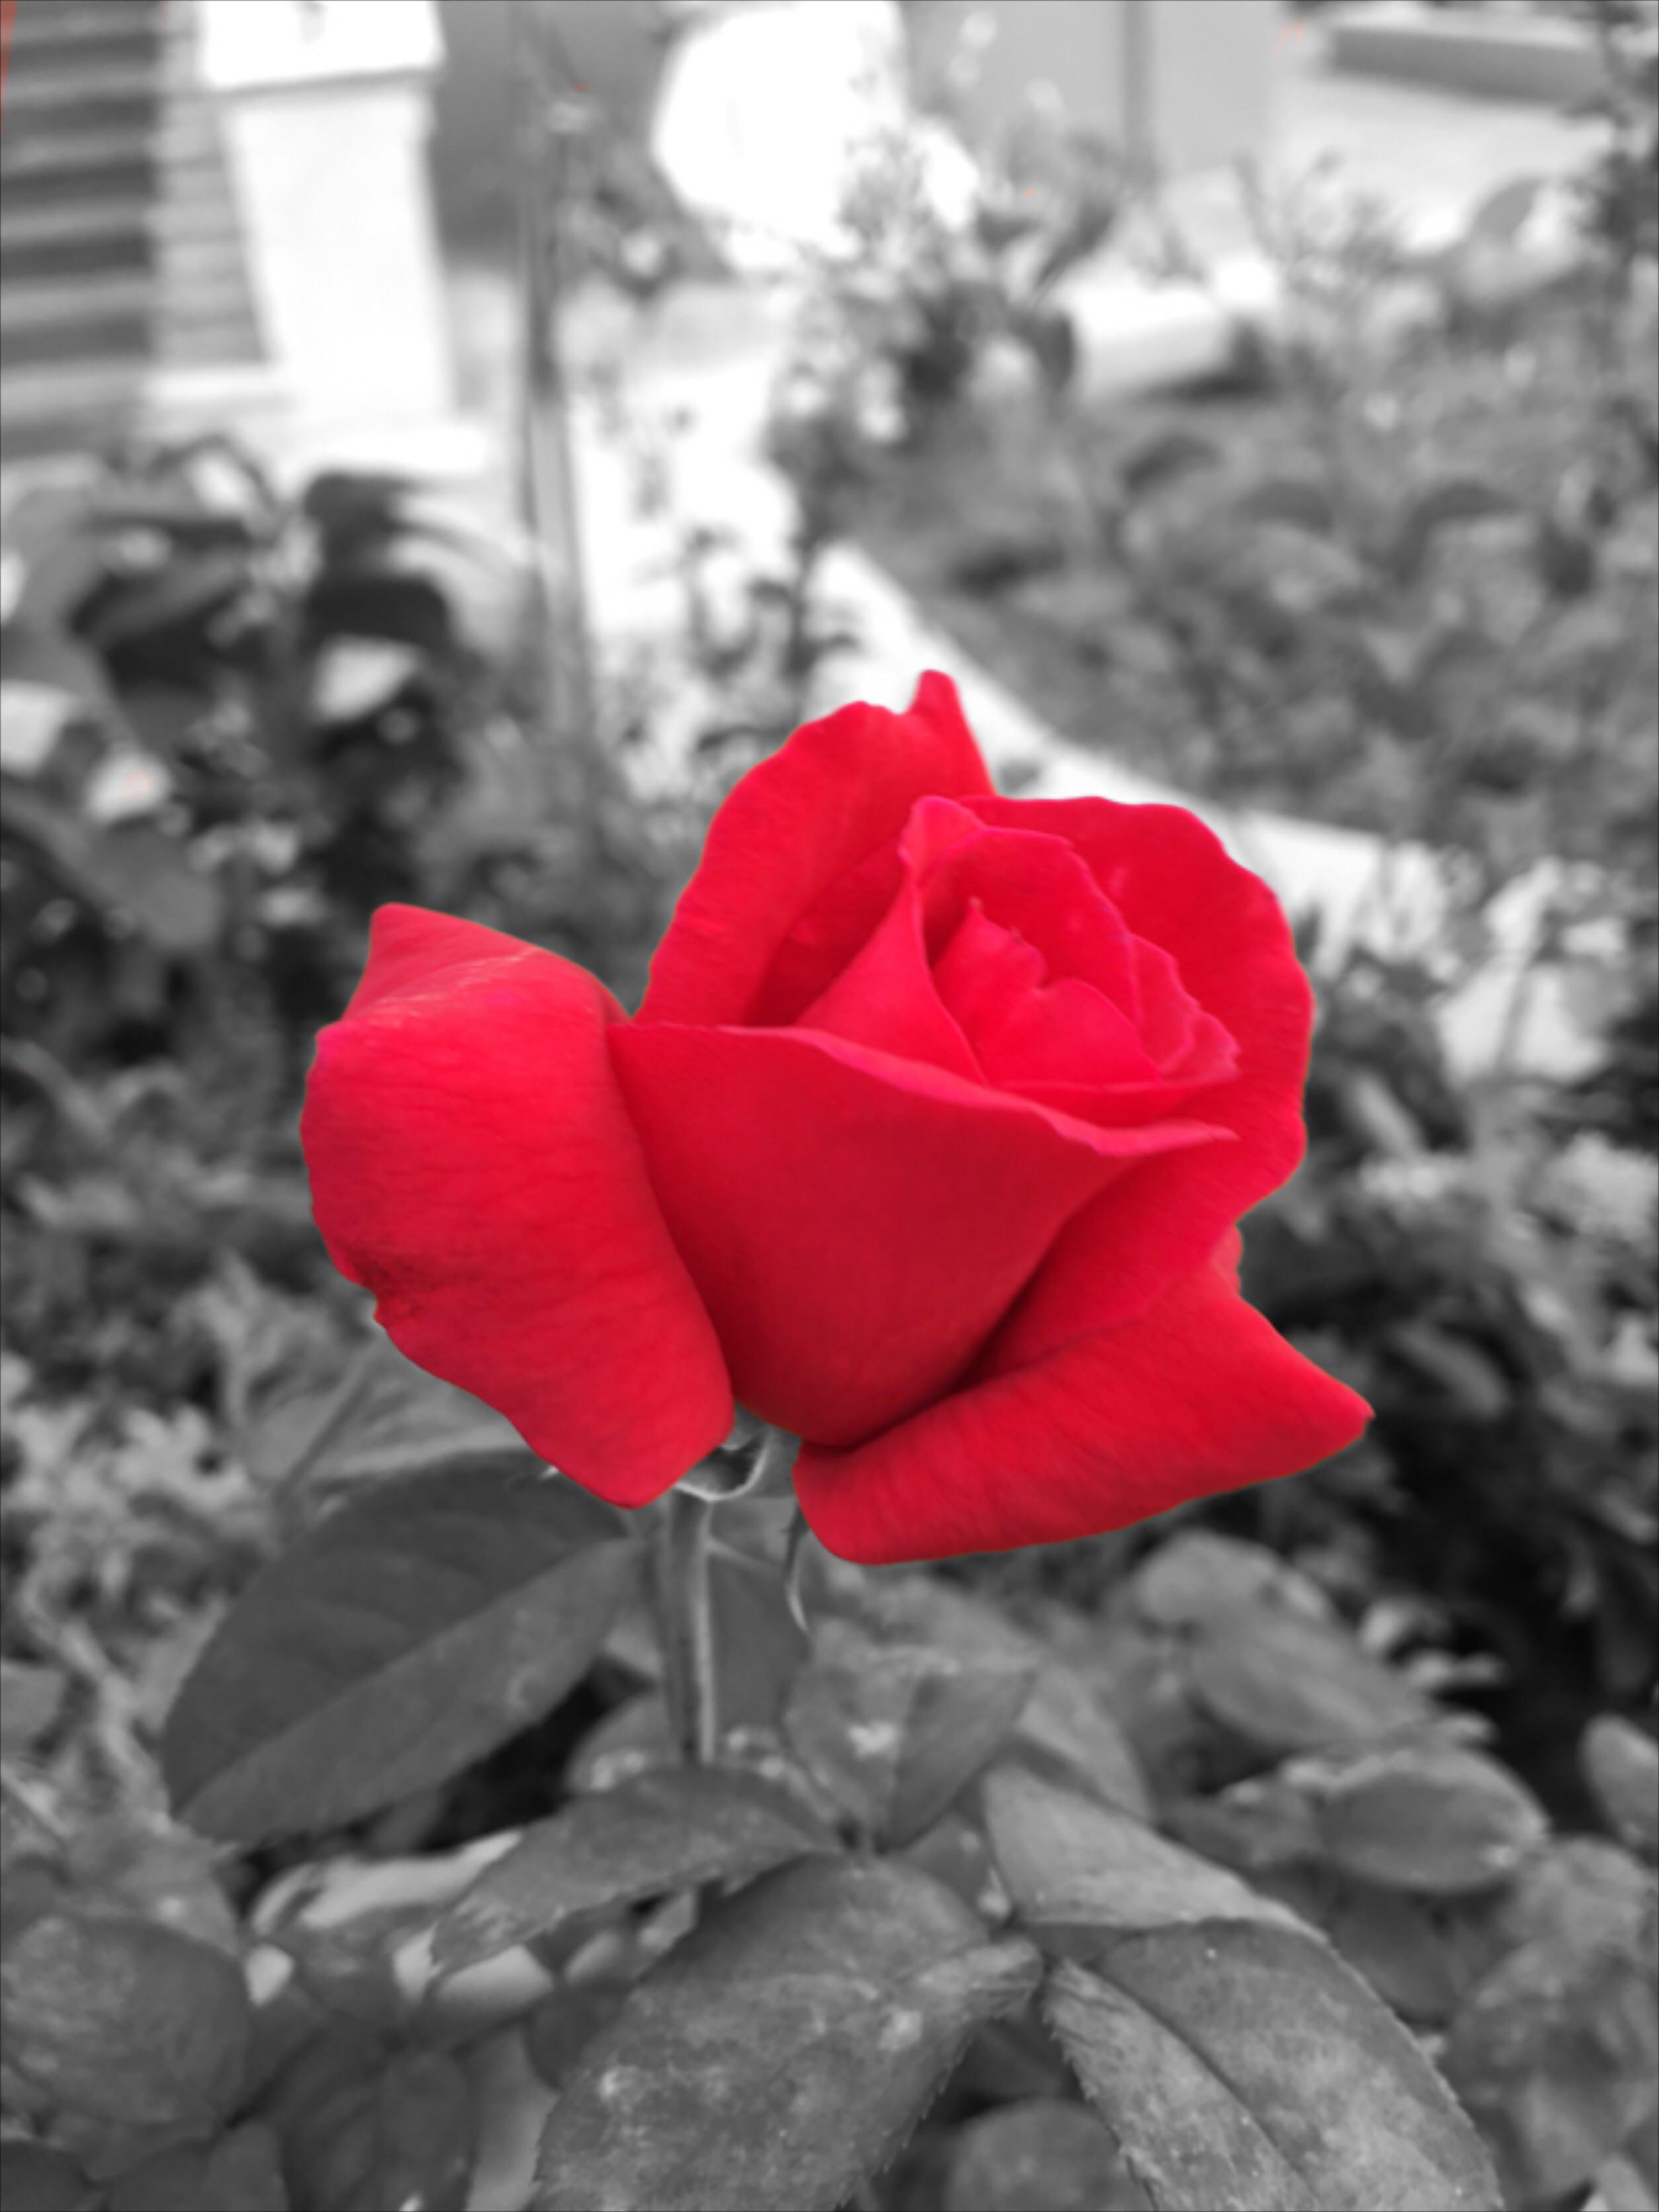 Kostenloses Stock Foto zu halsband, rose, rot, rote rose